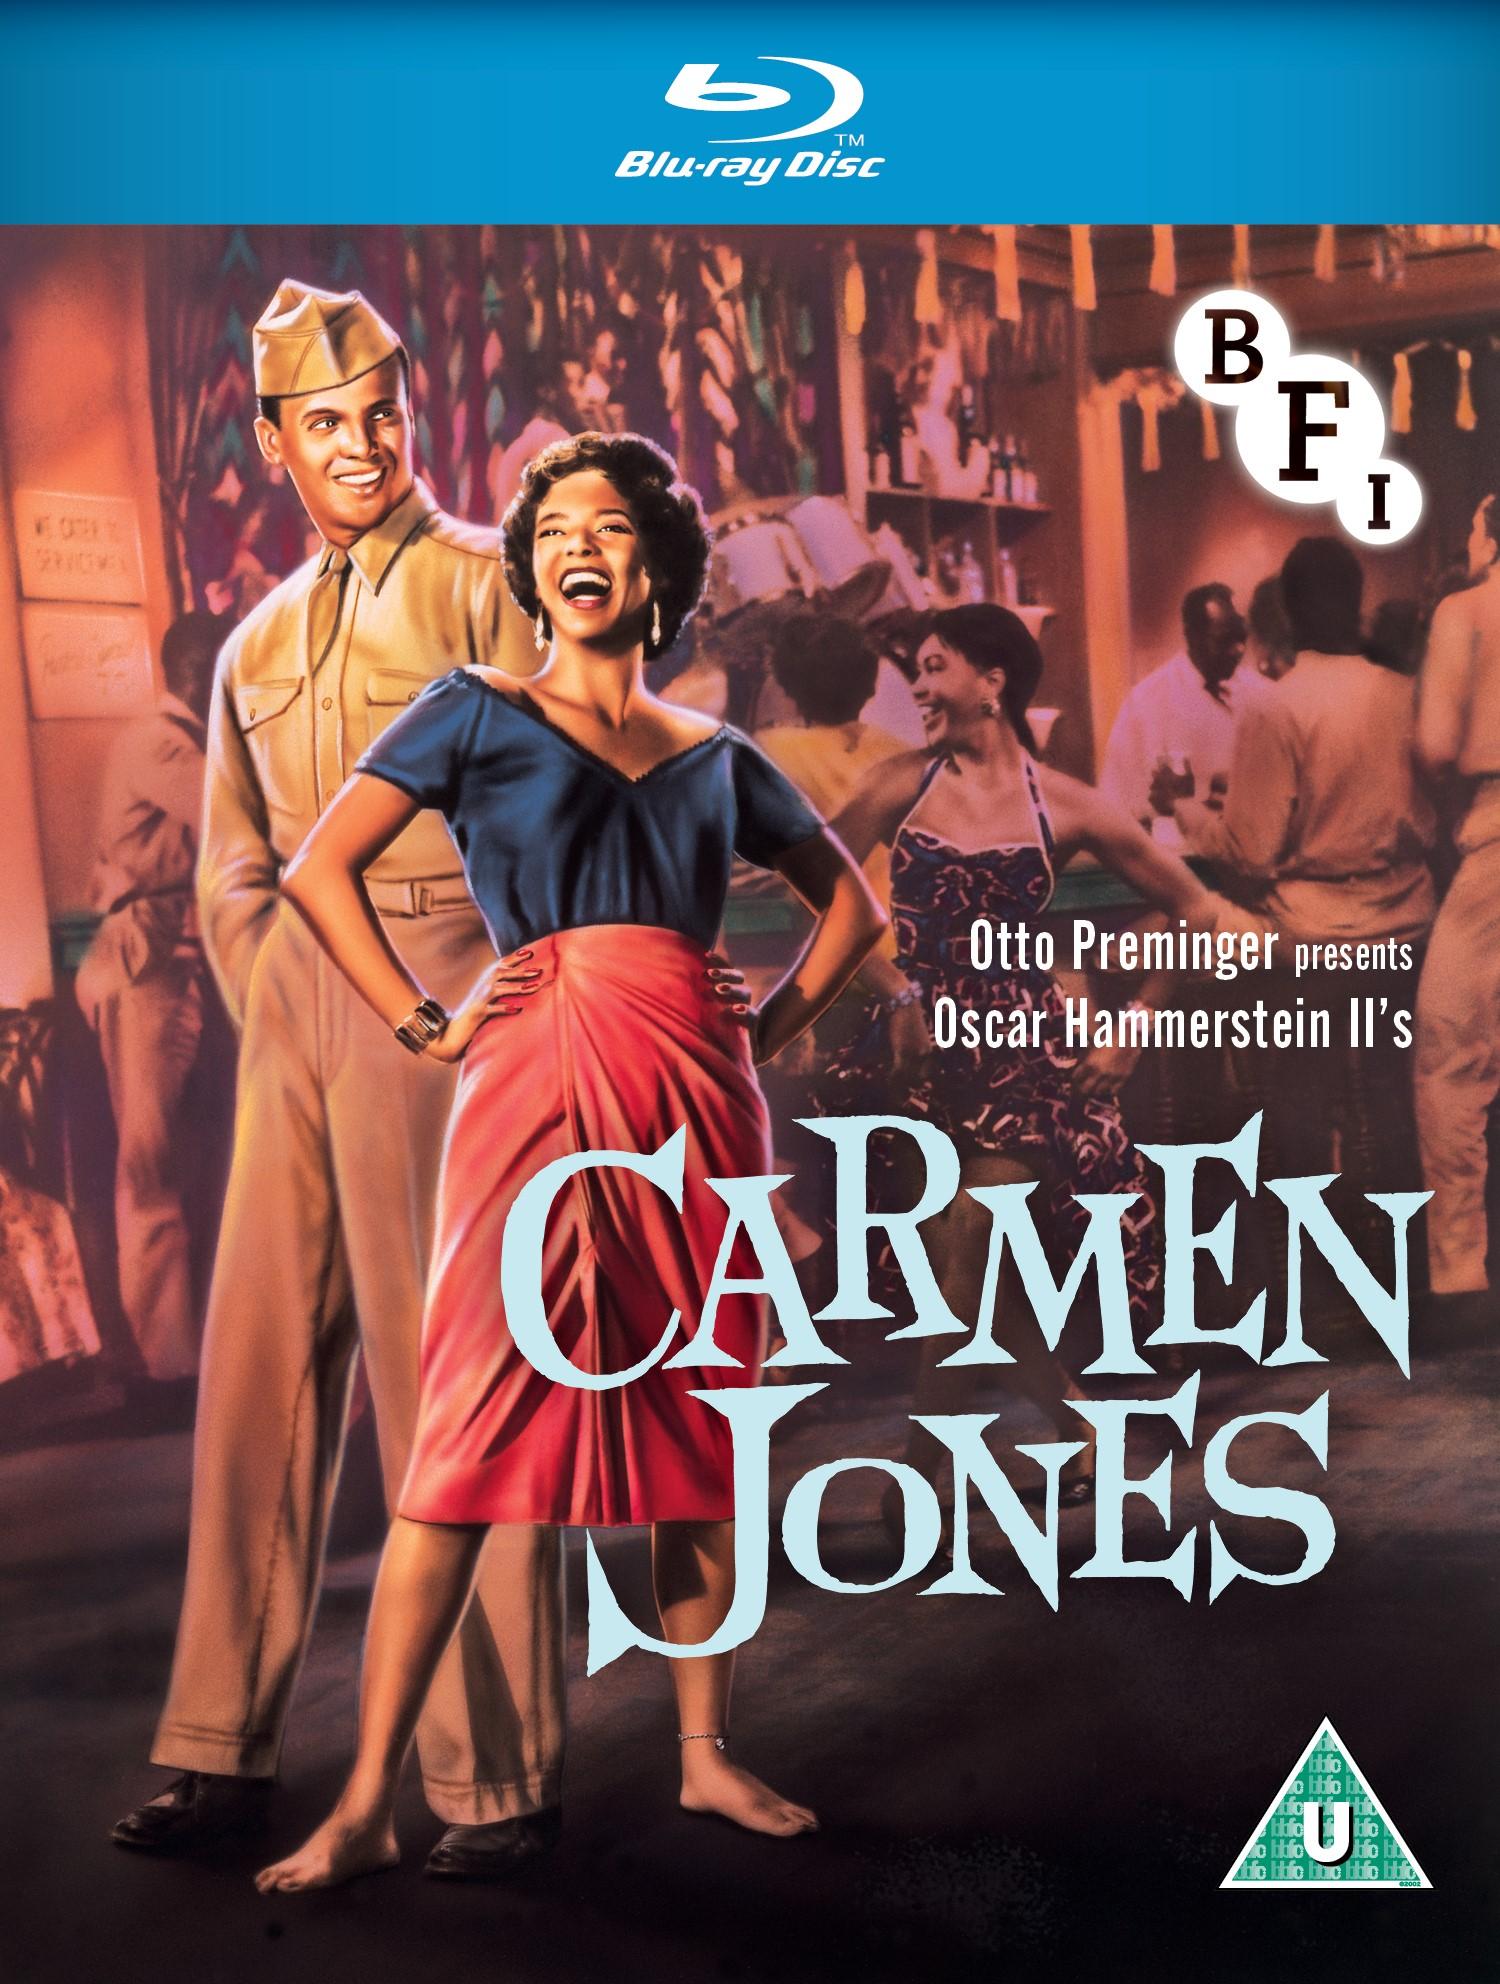 Buy Carmen Jones Blu-ray